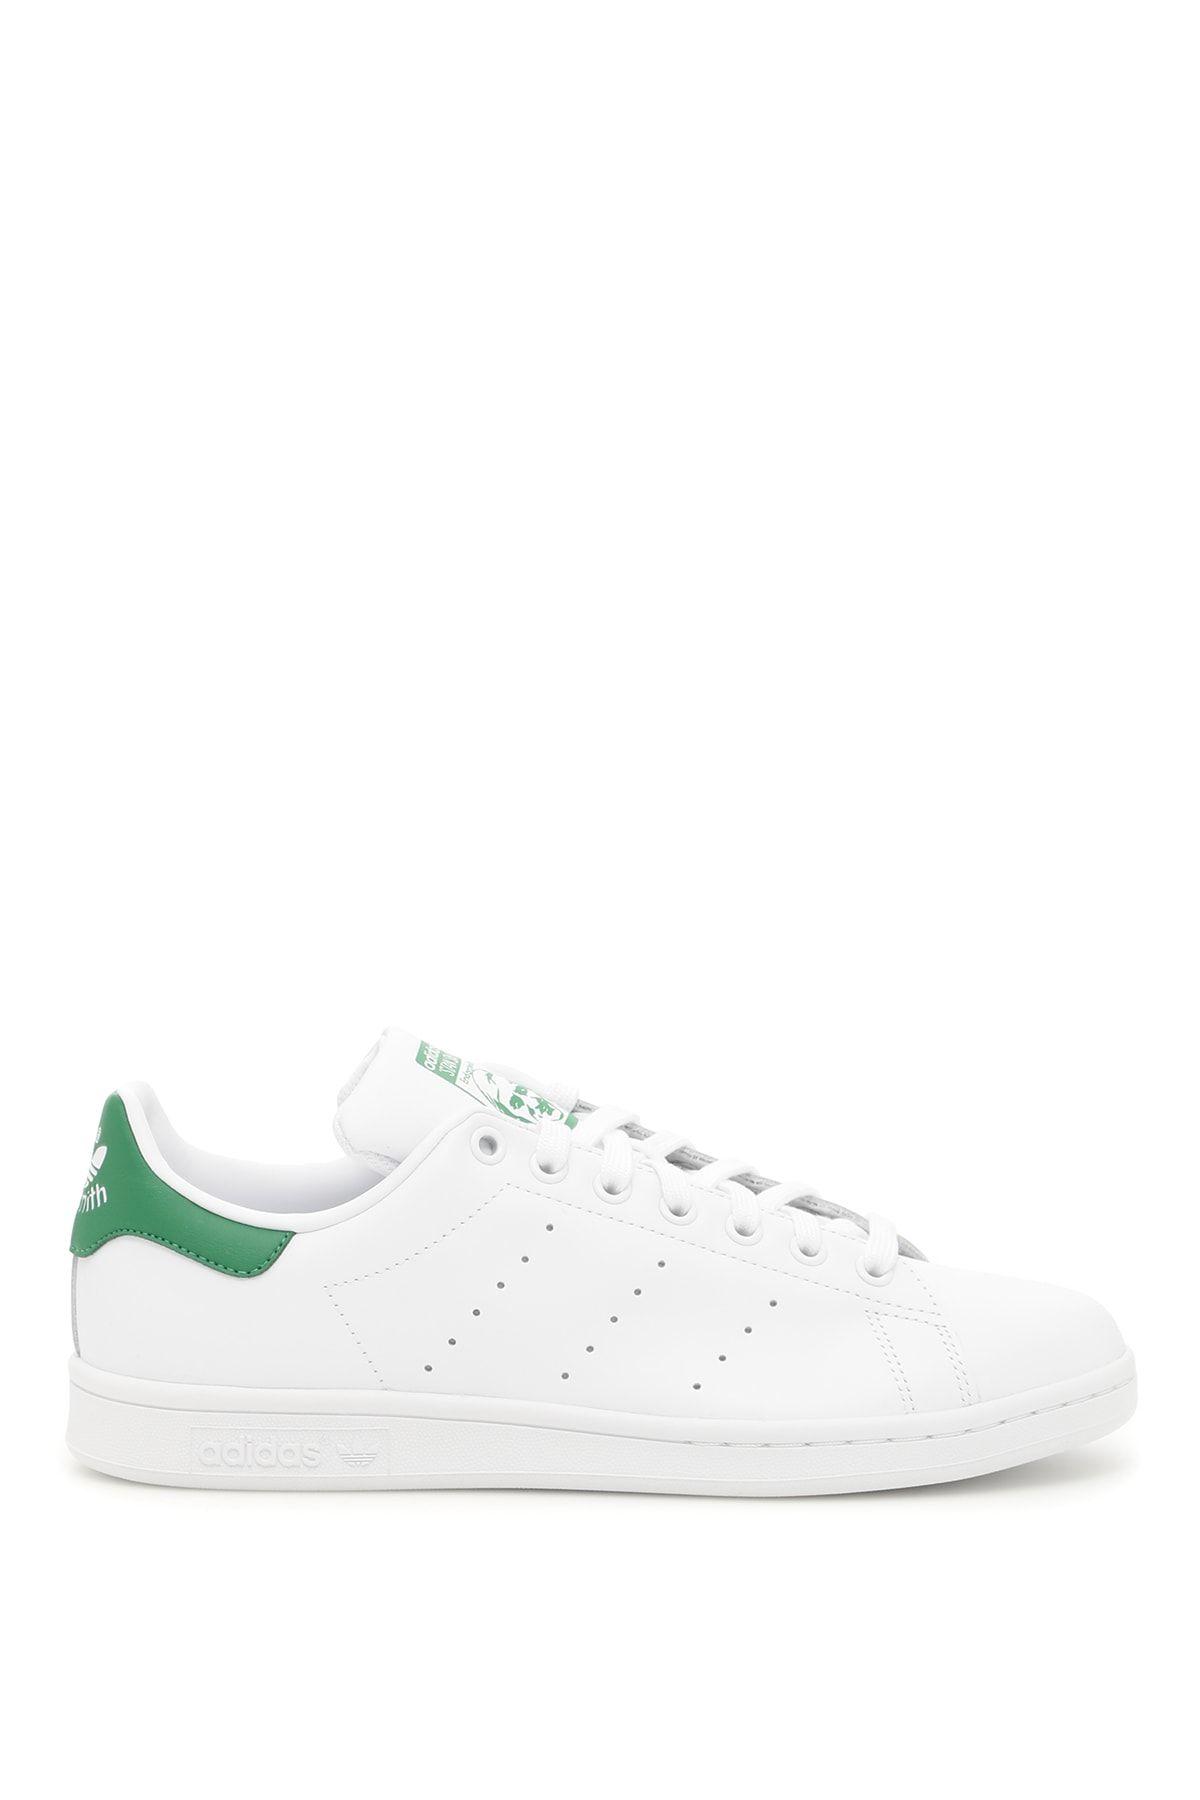 Adidas Adidas Stan Smith Sneakers en 2020